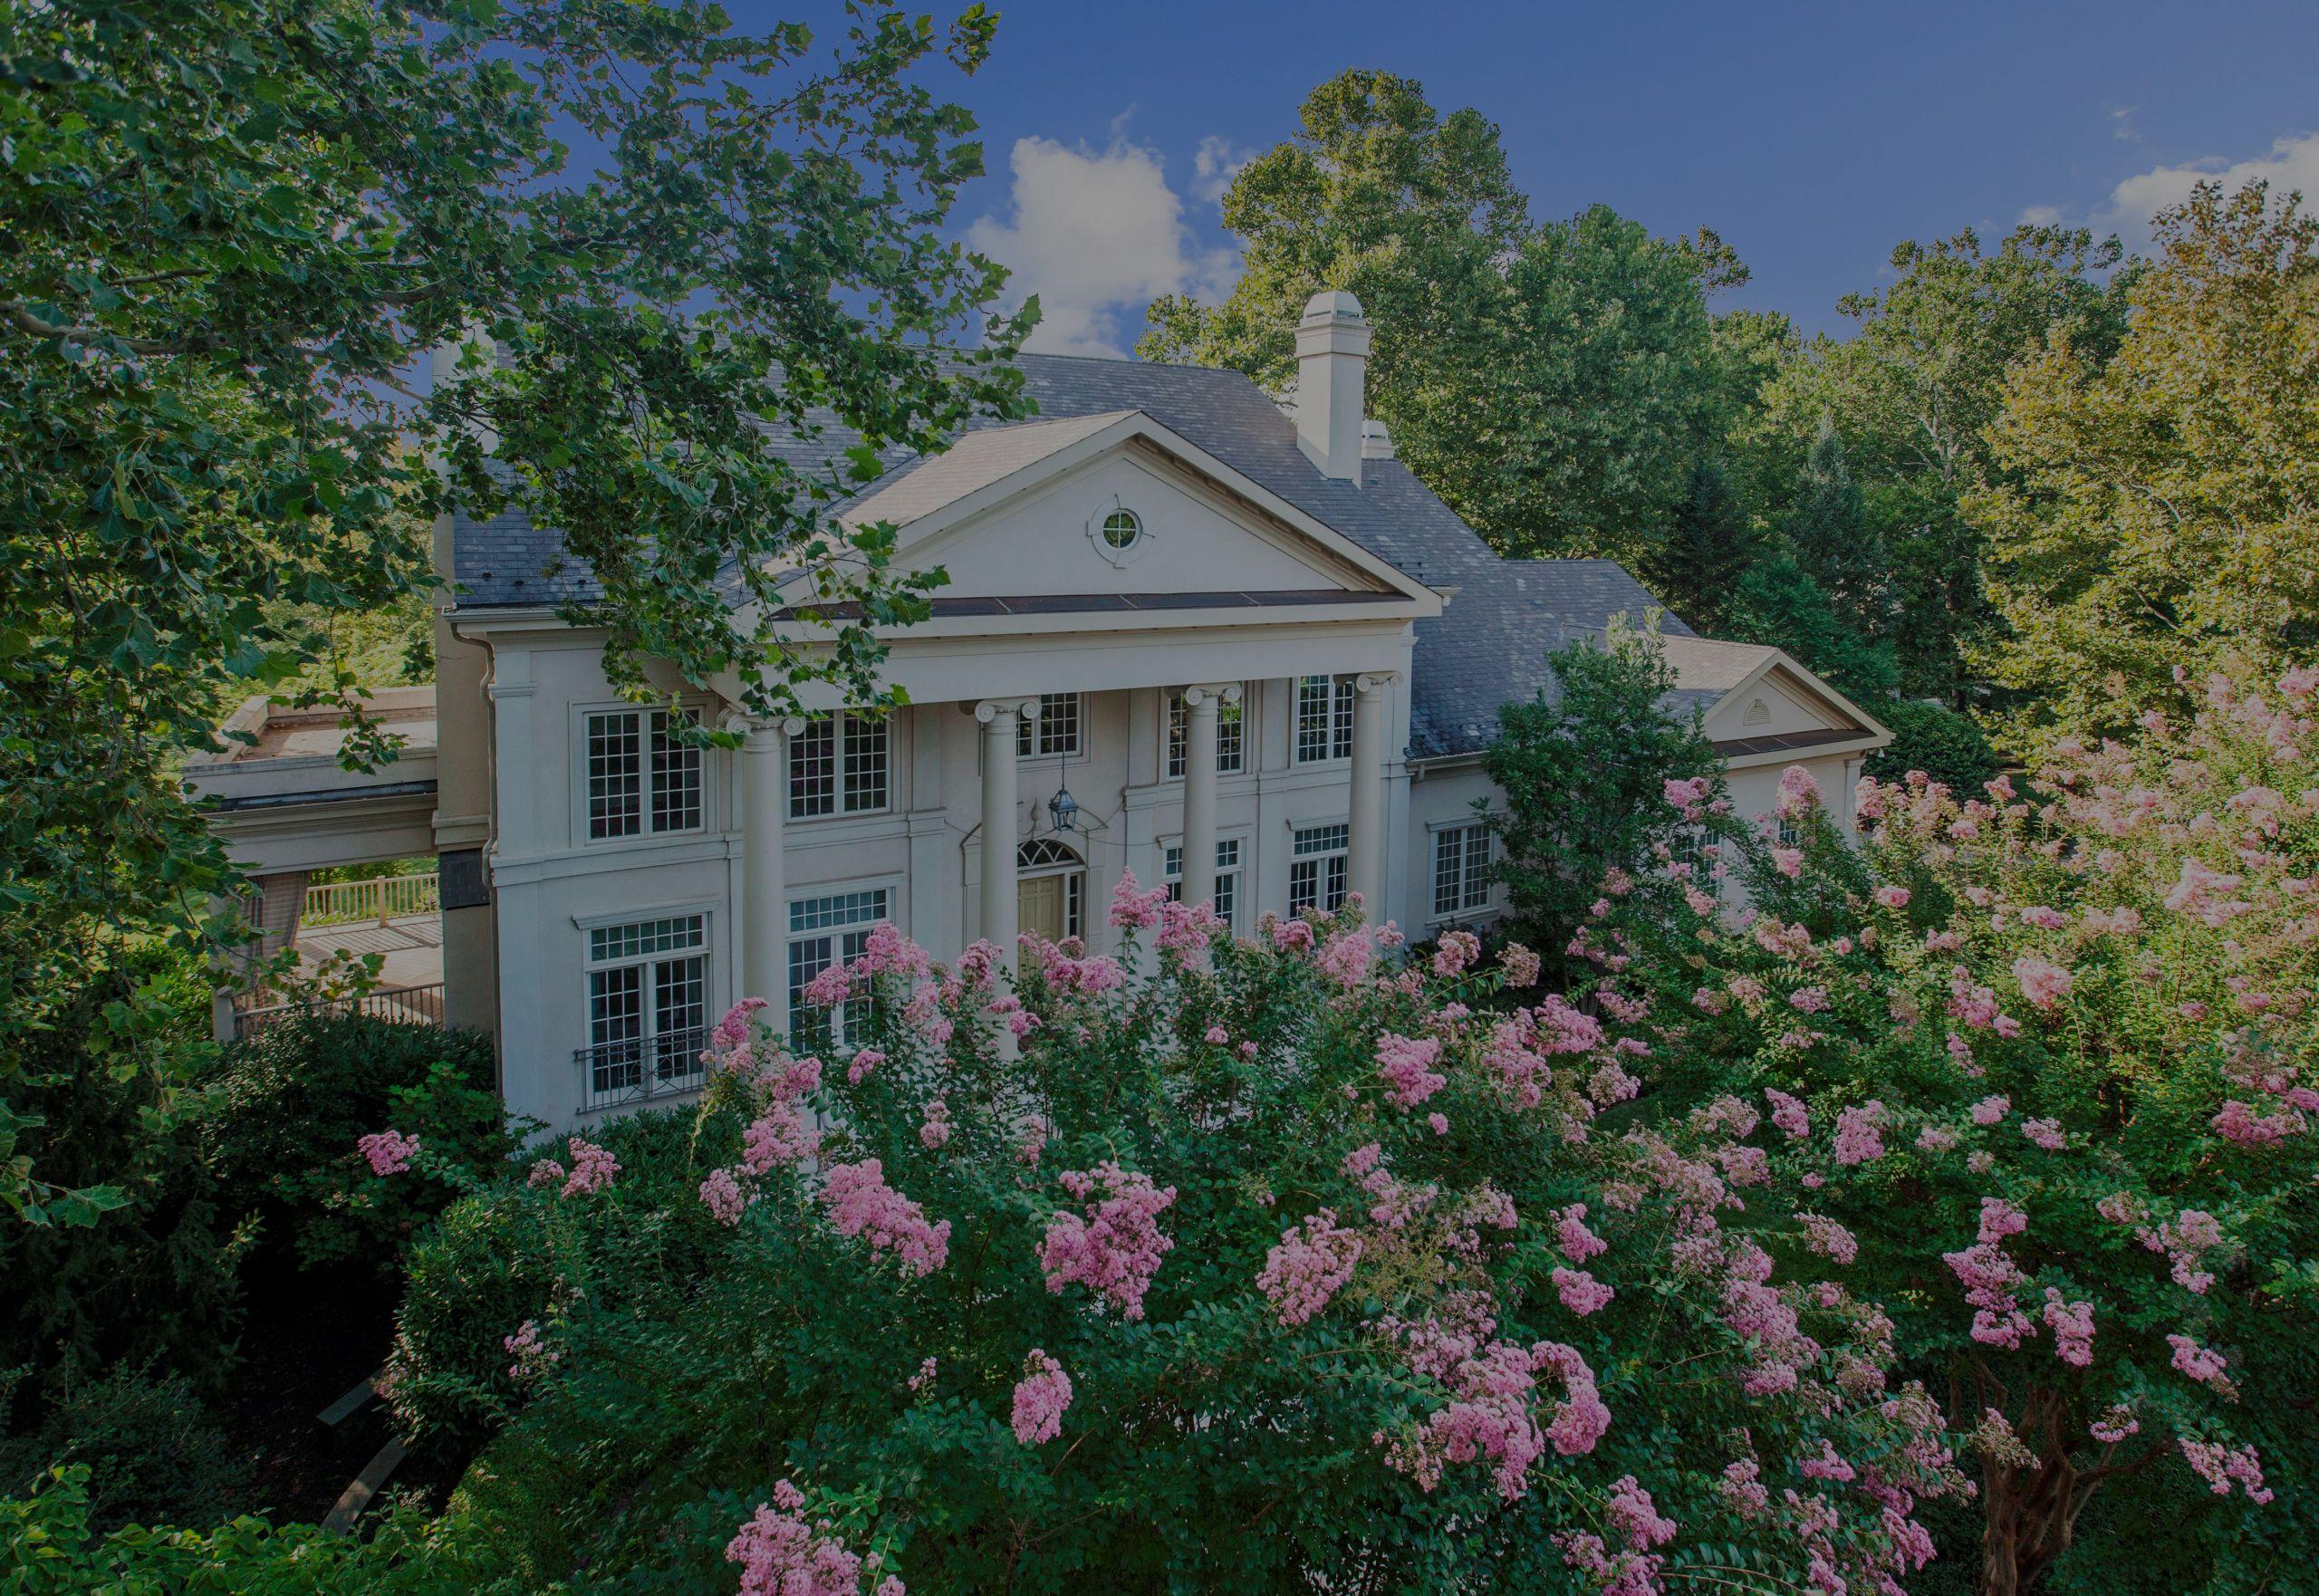 Sold: 8600 York Manor Way, Potomac, MD